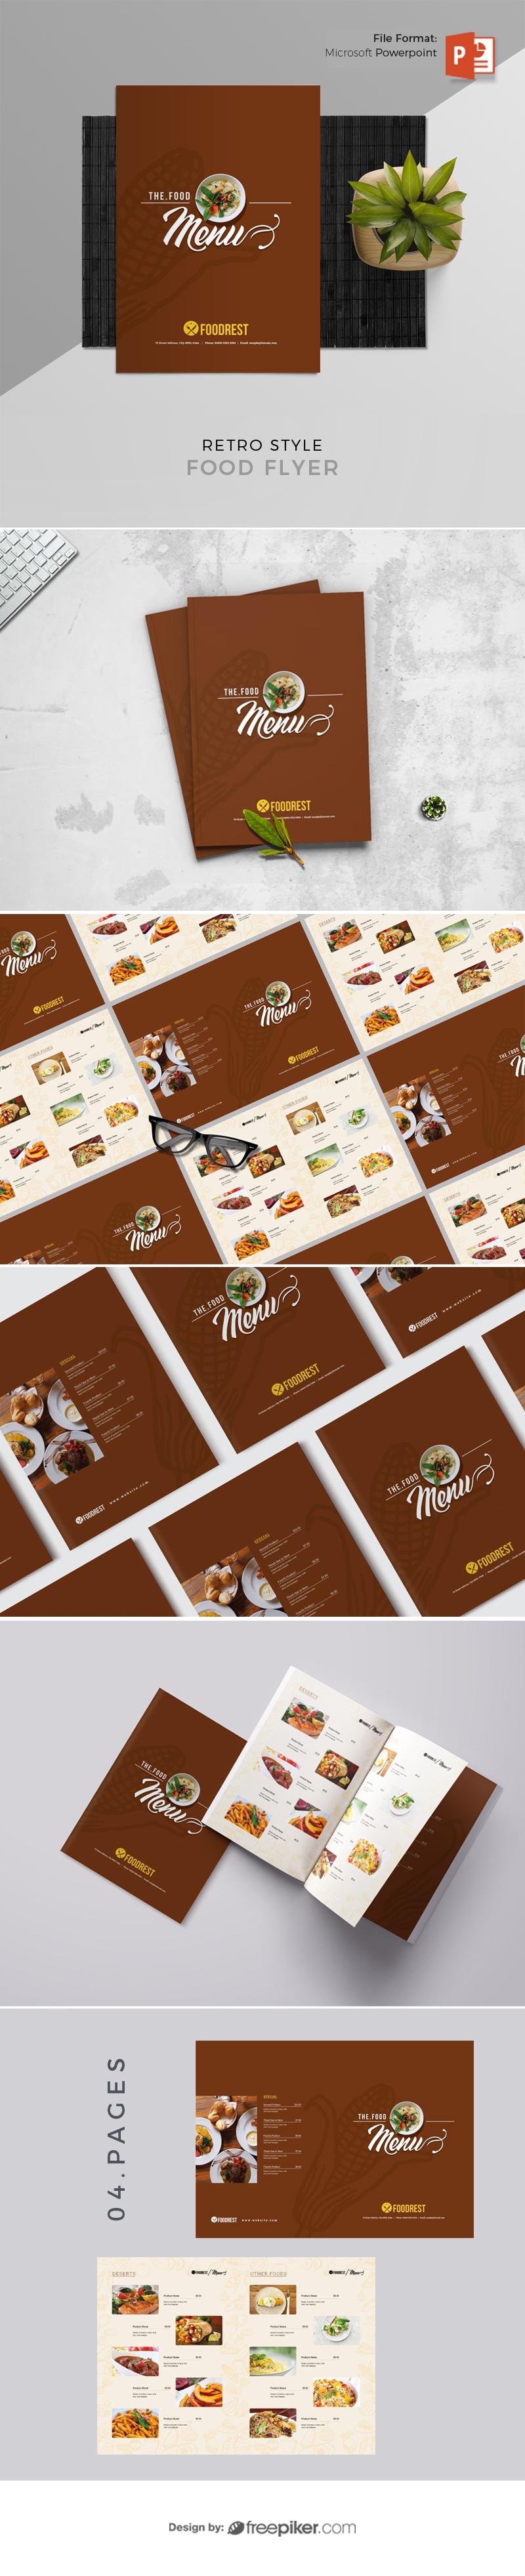 Food Menu Booklet with Price List Photo Gallery